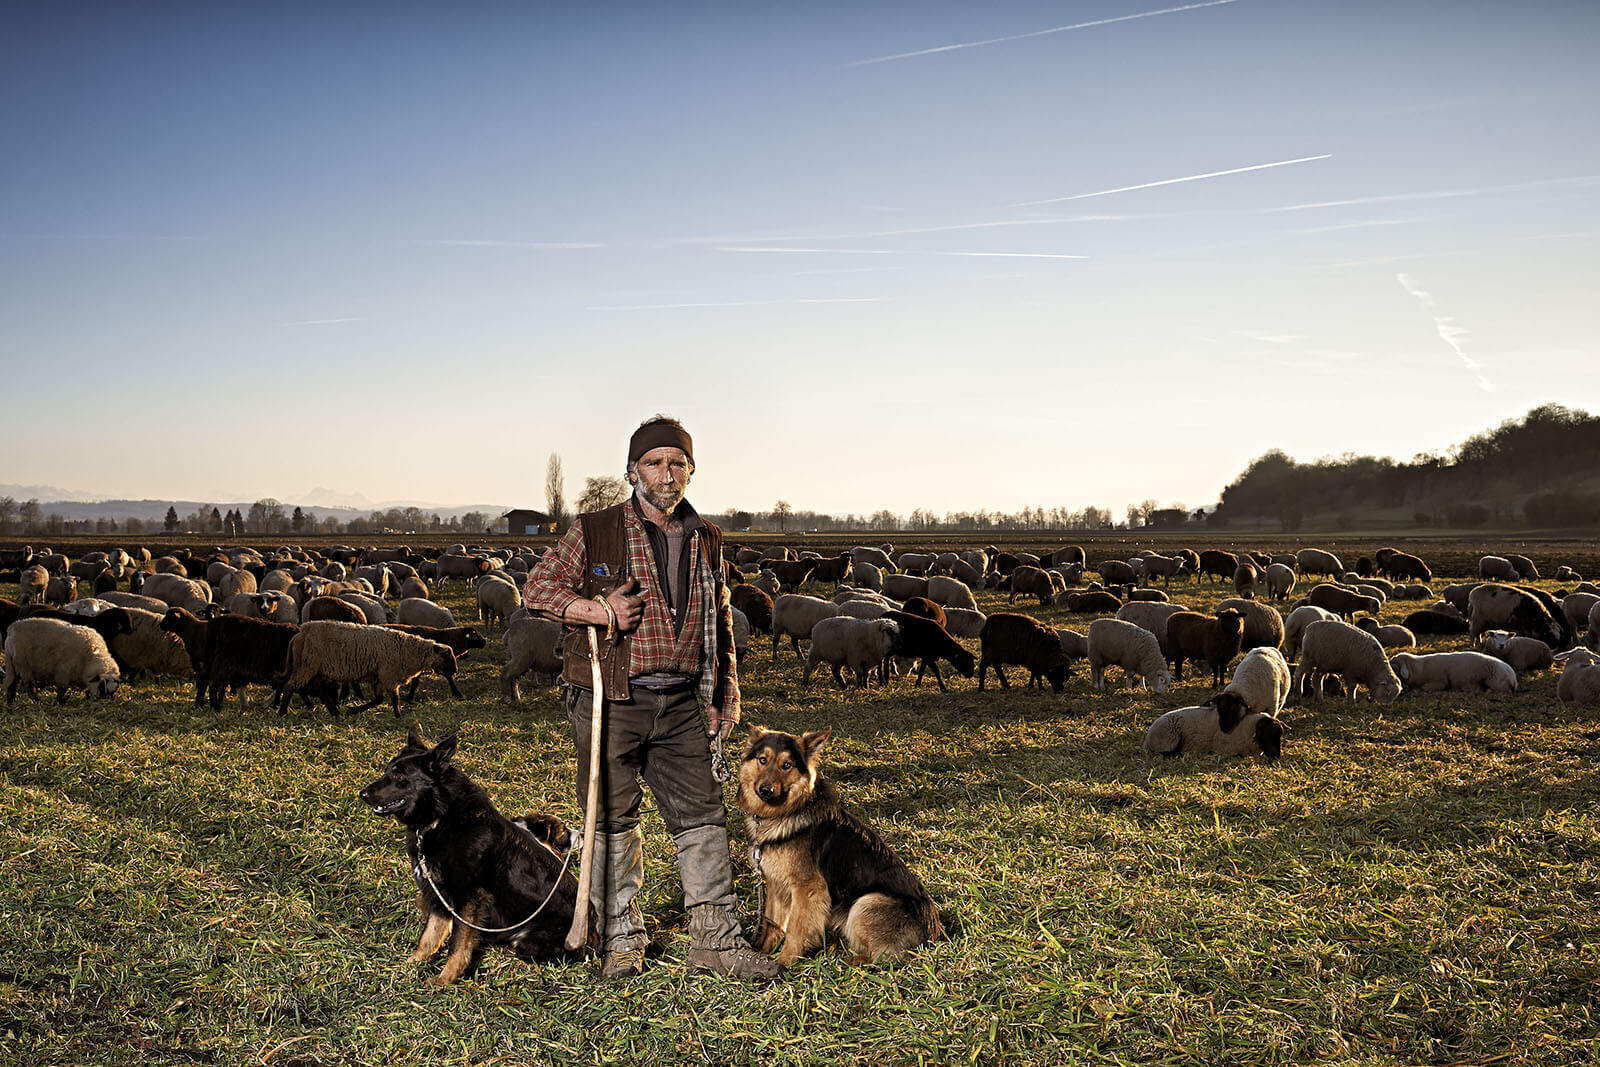 Landwirt_Rudy_Canonica_0729_crop.jpg